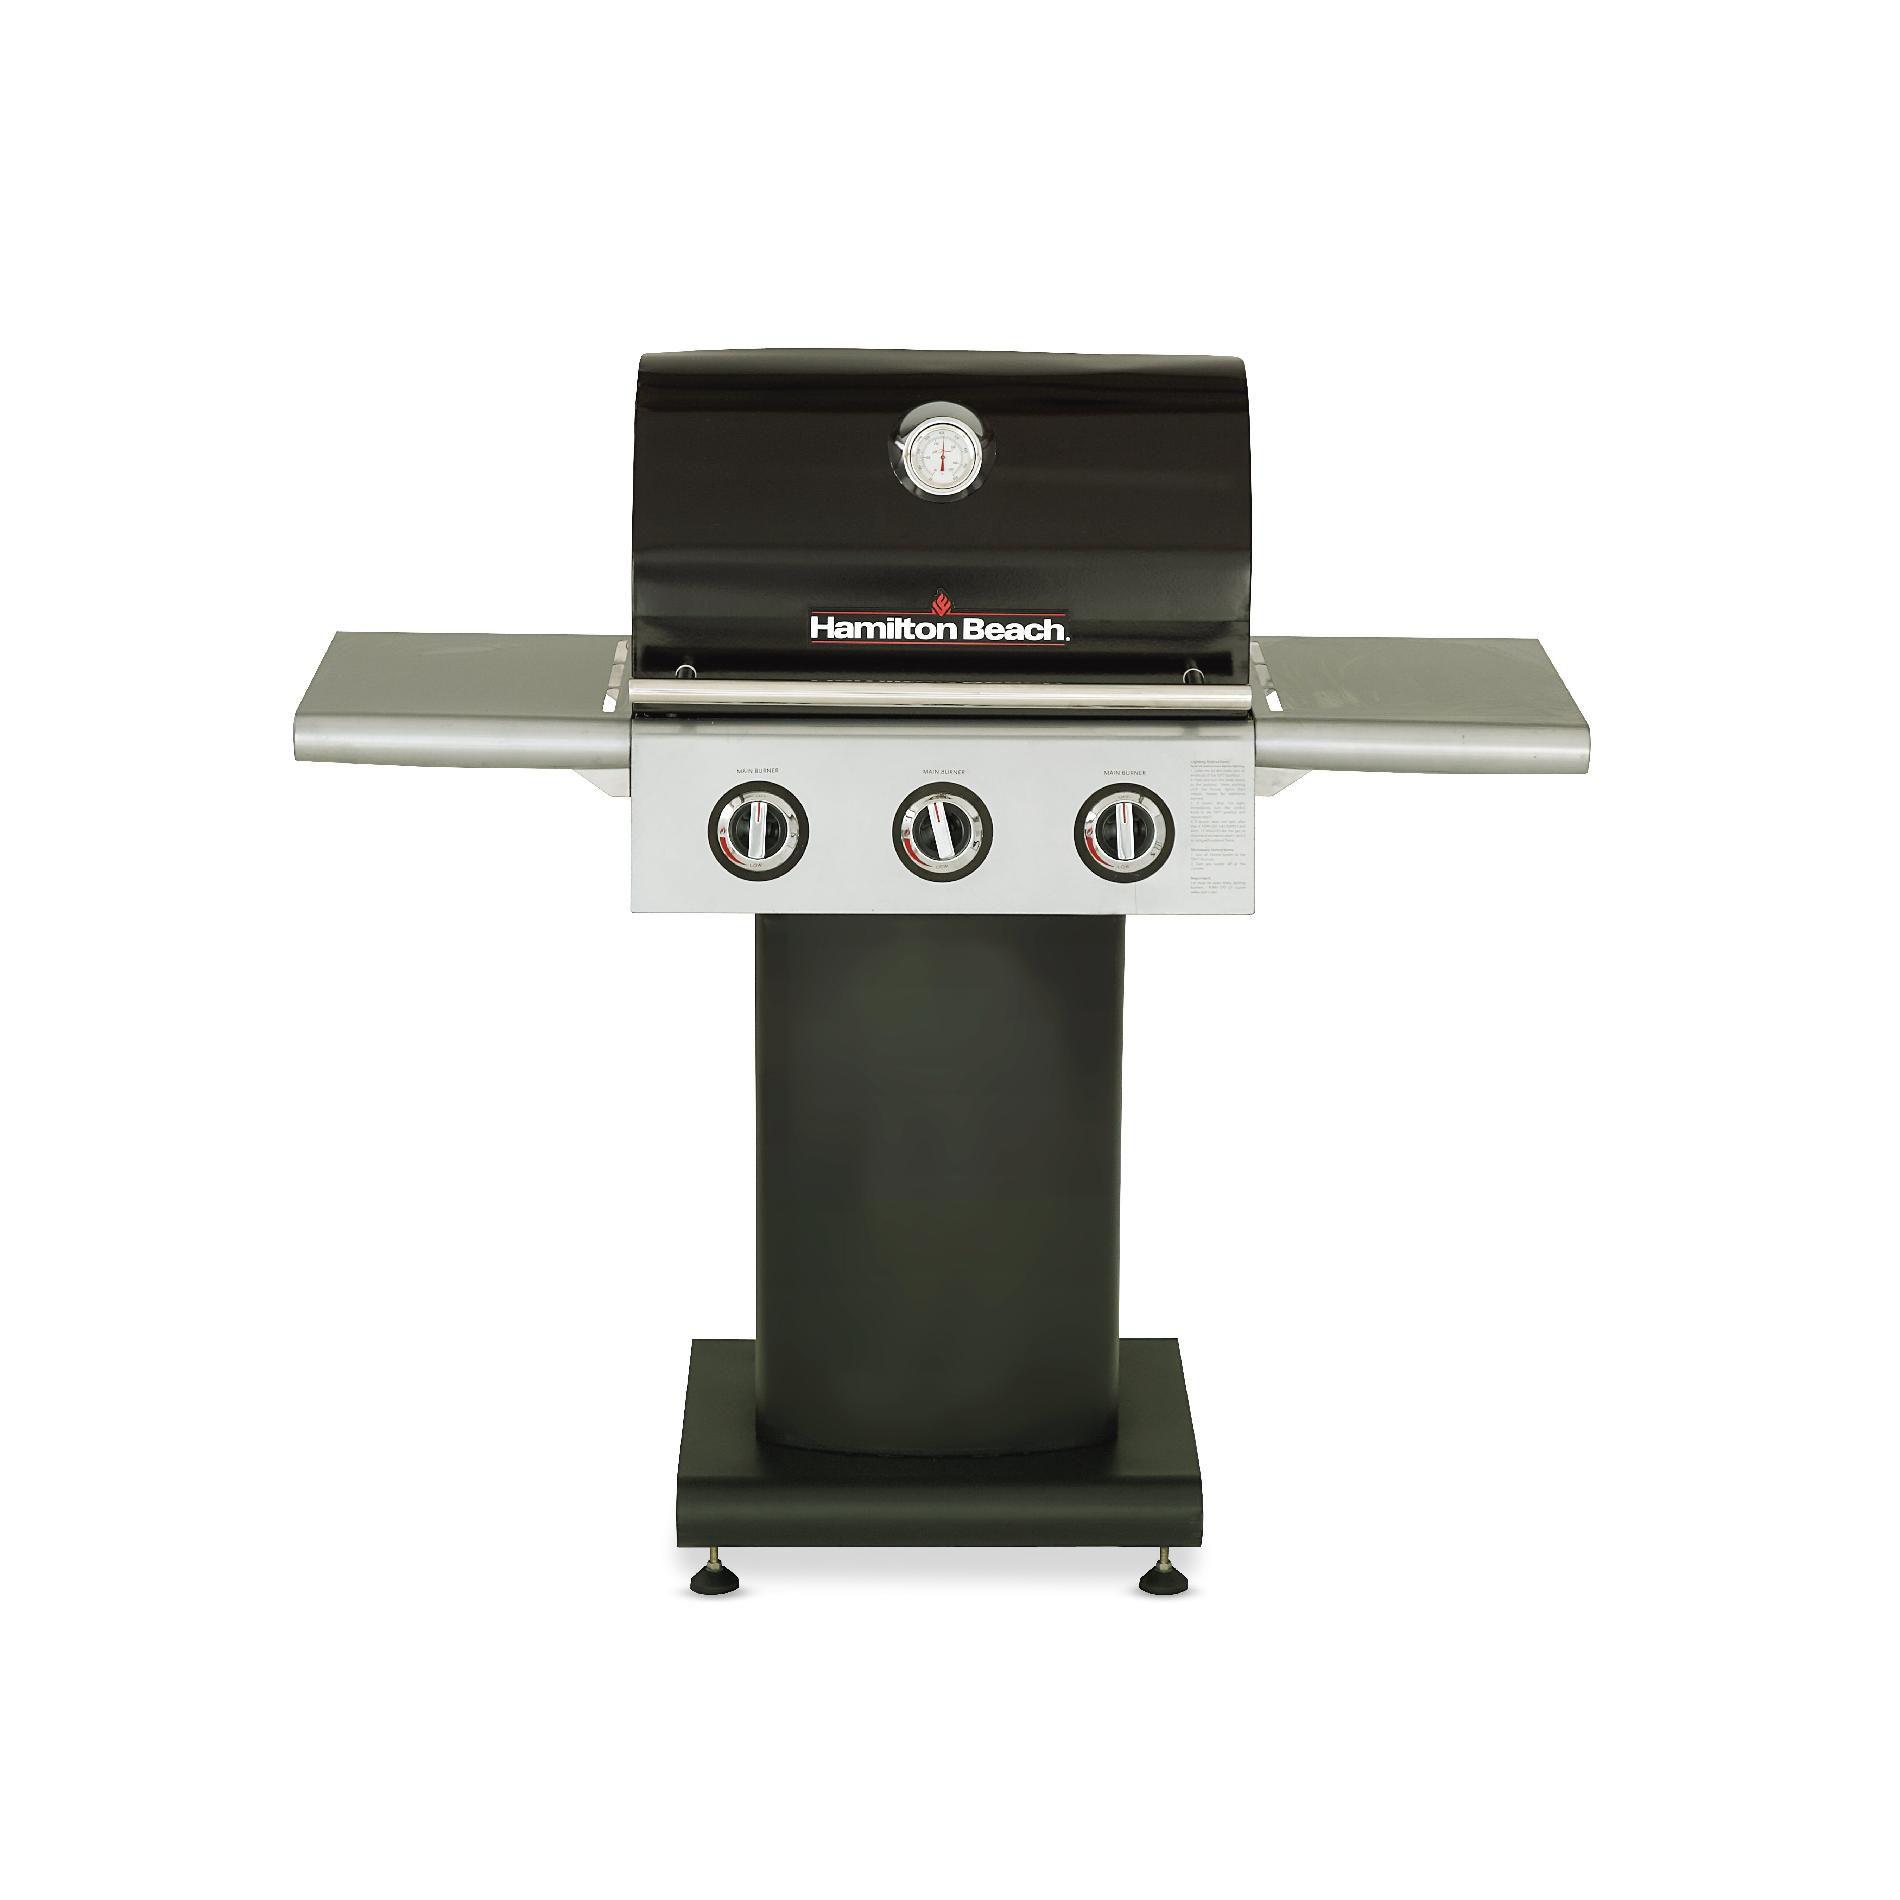 Hamilton Beach 3-Burner Pedestal Gas Grill